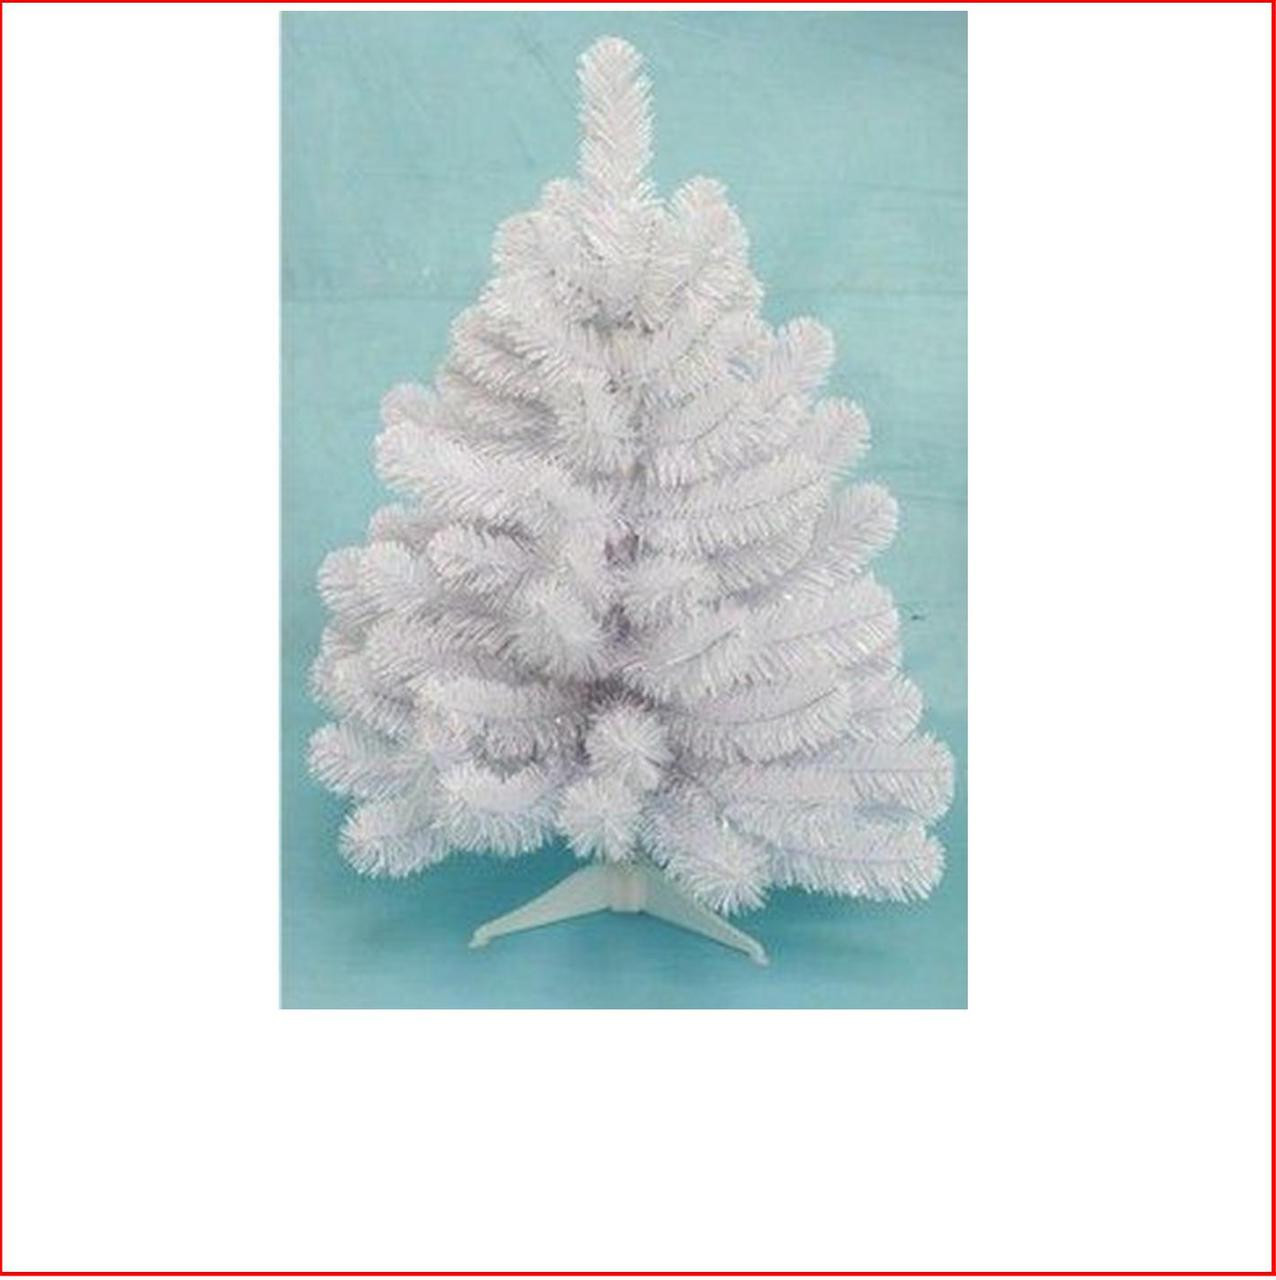 Icelandic Pine Iridescent 3ft